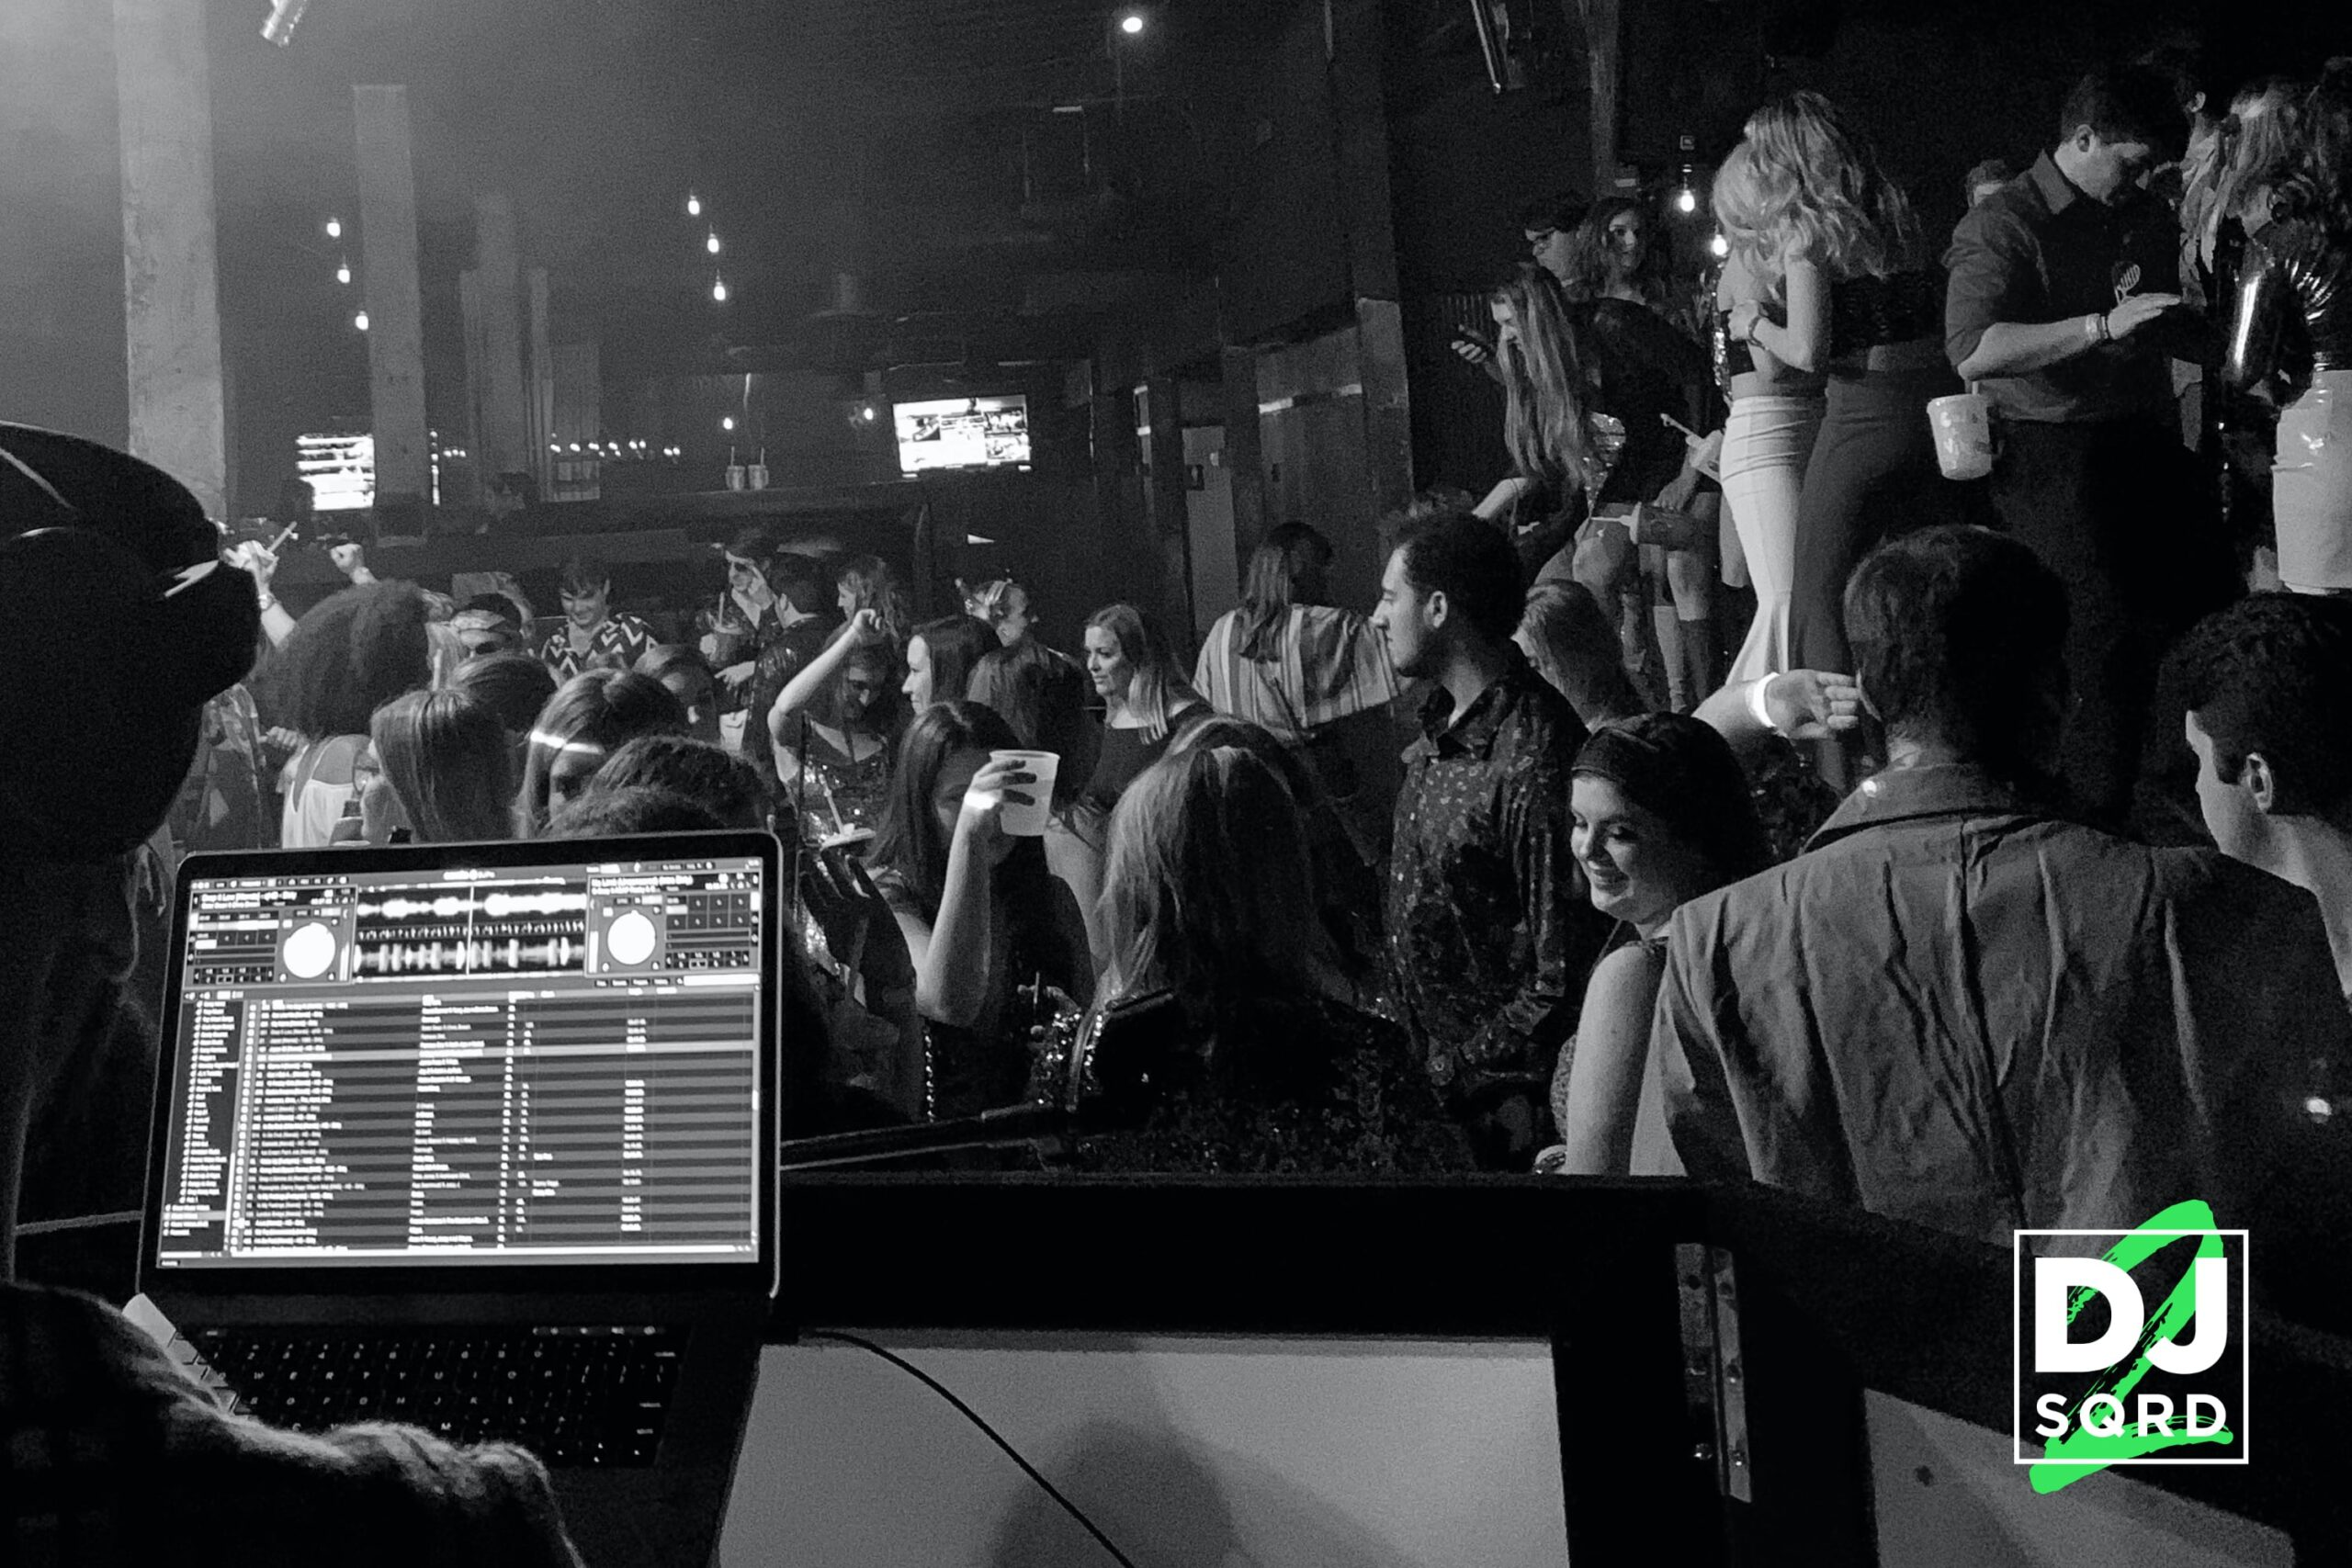 DJ SQRD at XO Nightclub